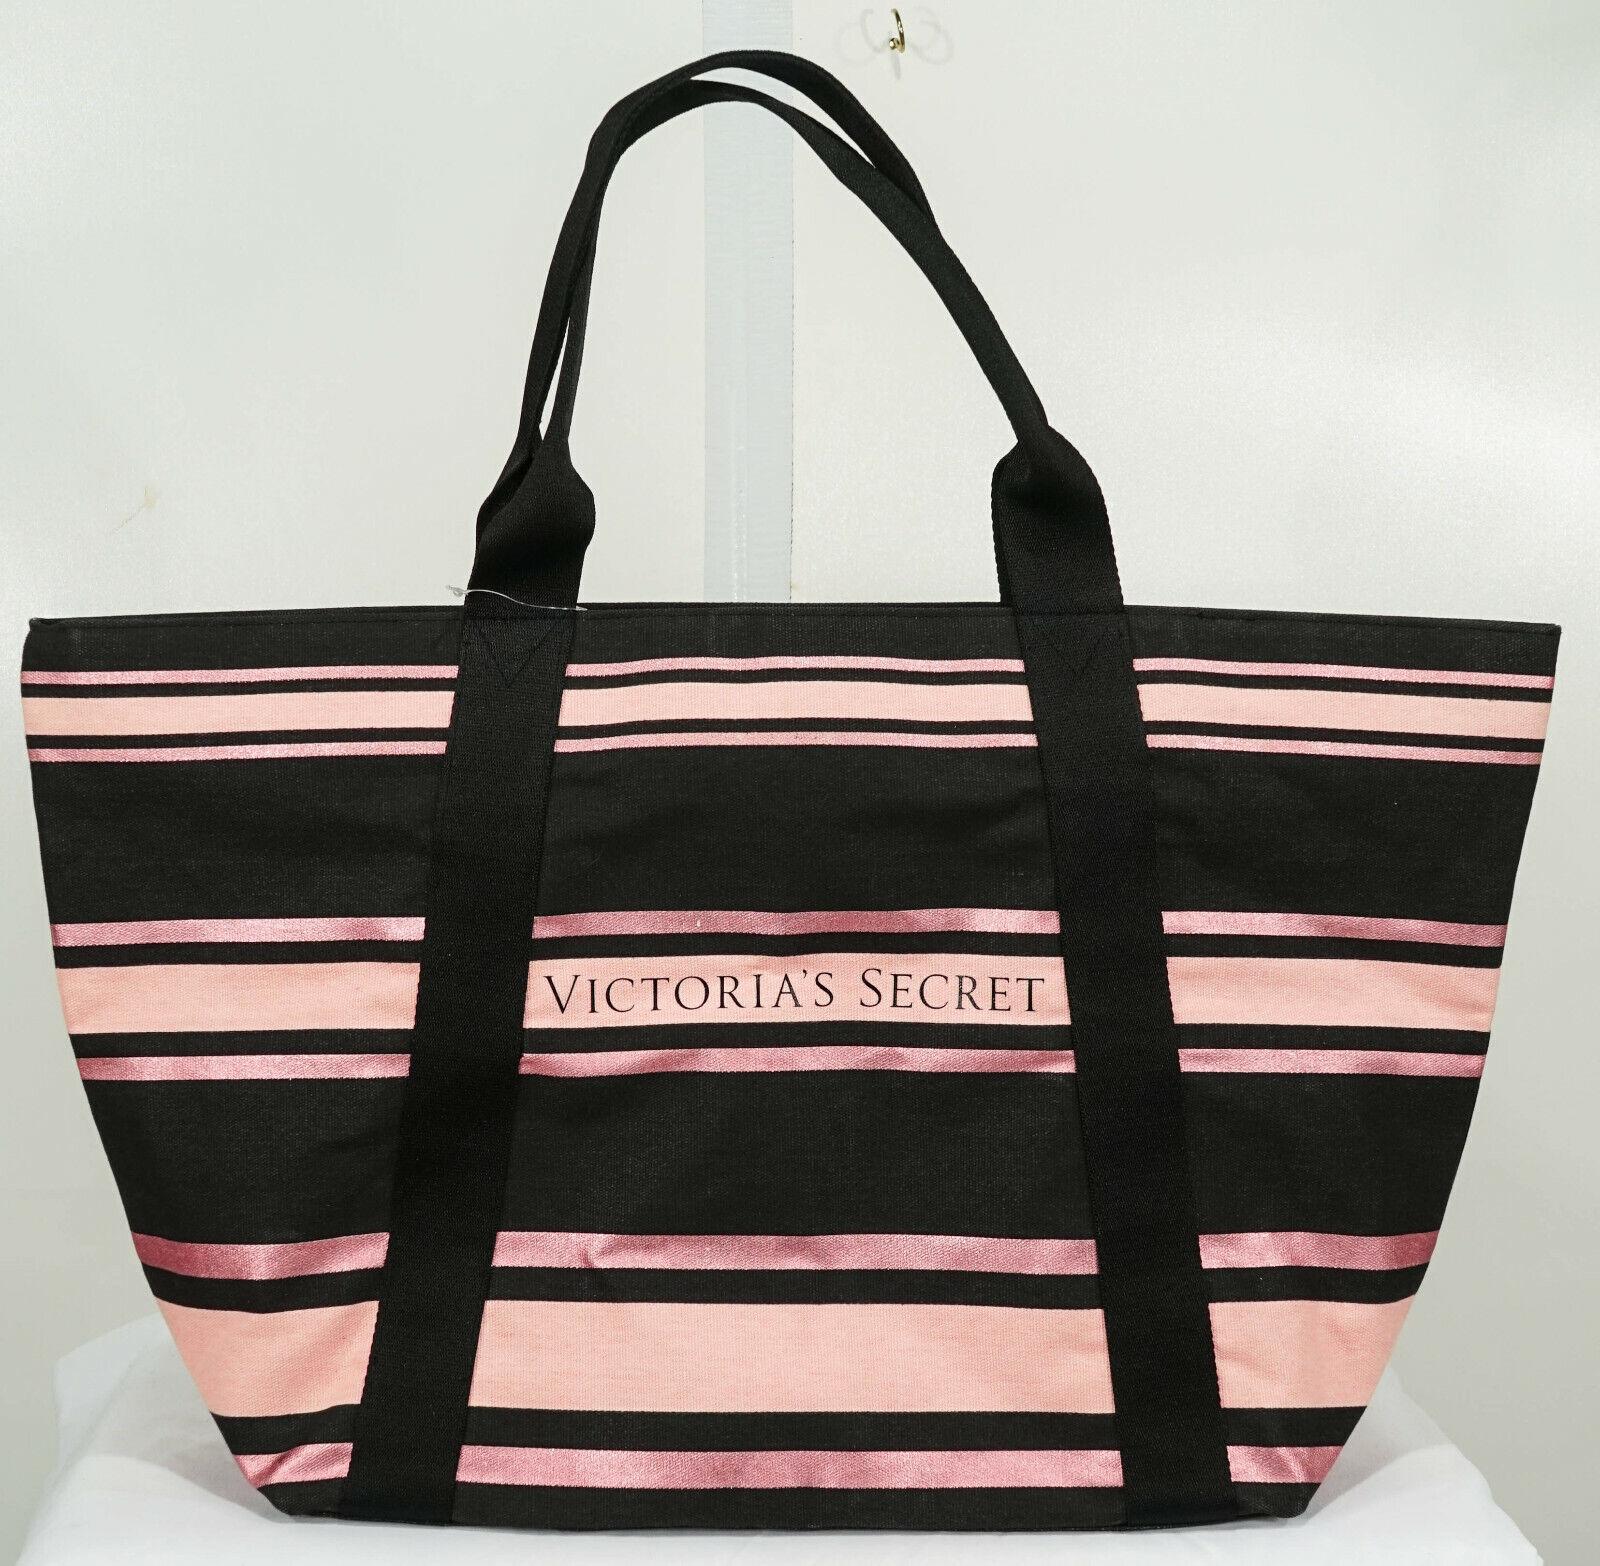 NWT Victoria's Secret Black + Pink Stripe Large Tote Bag